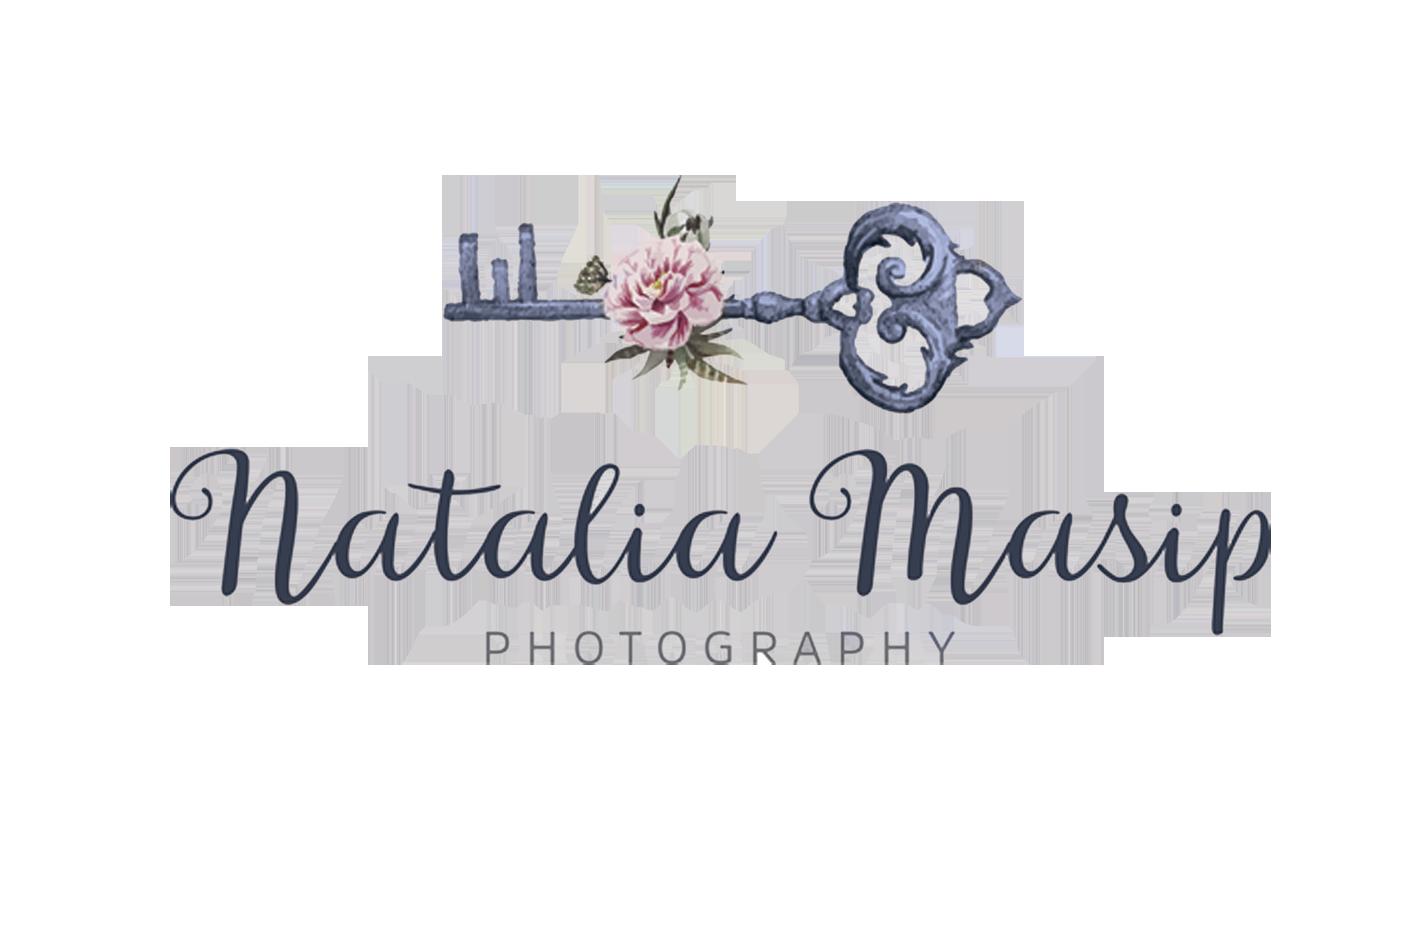 Natalia Masip - Fotografía